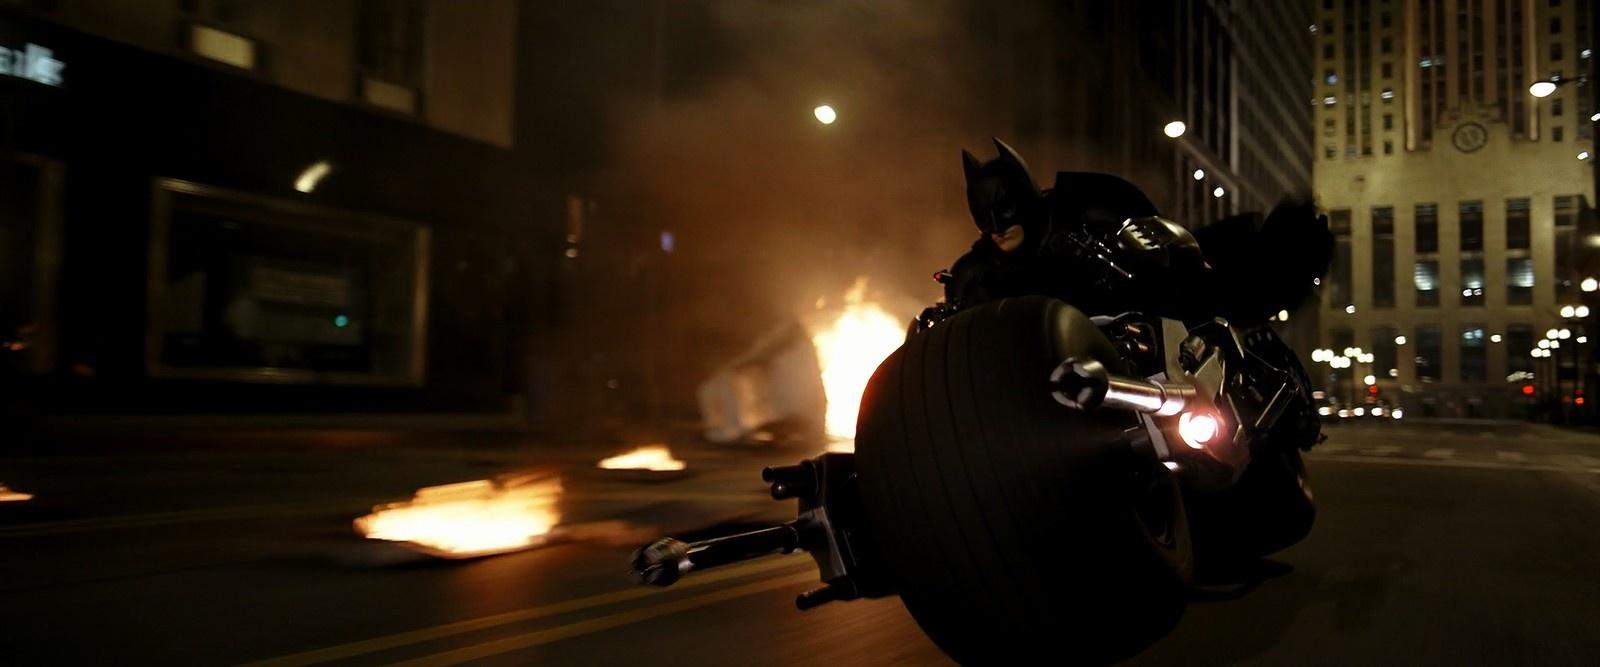 Galerie The Dark Knight : Le Chevalier noir 4